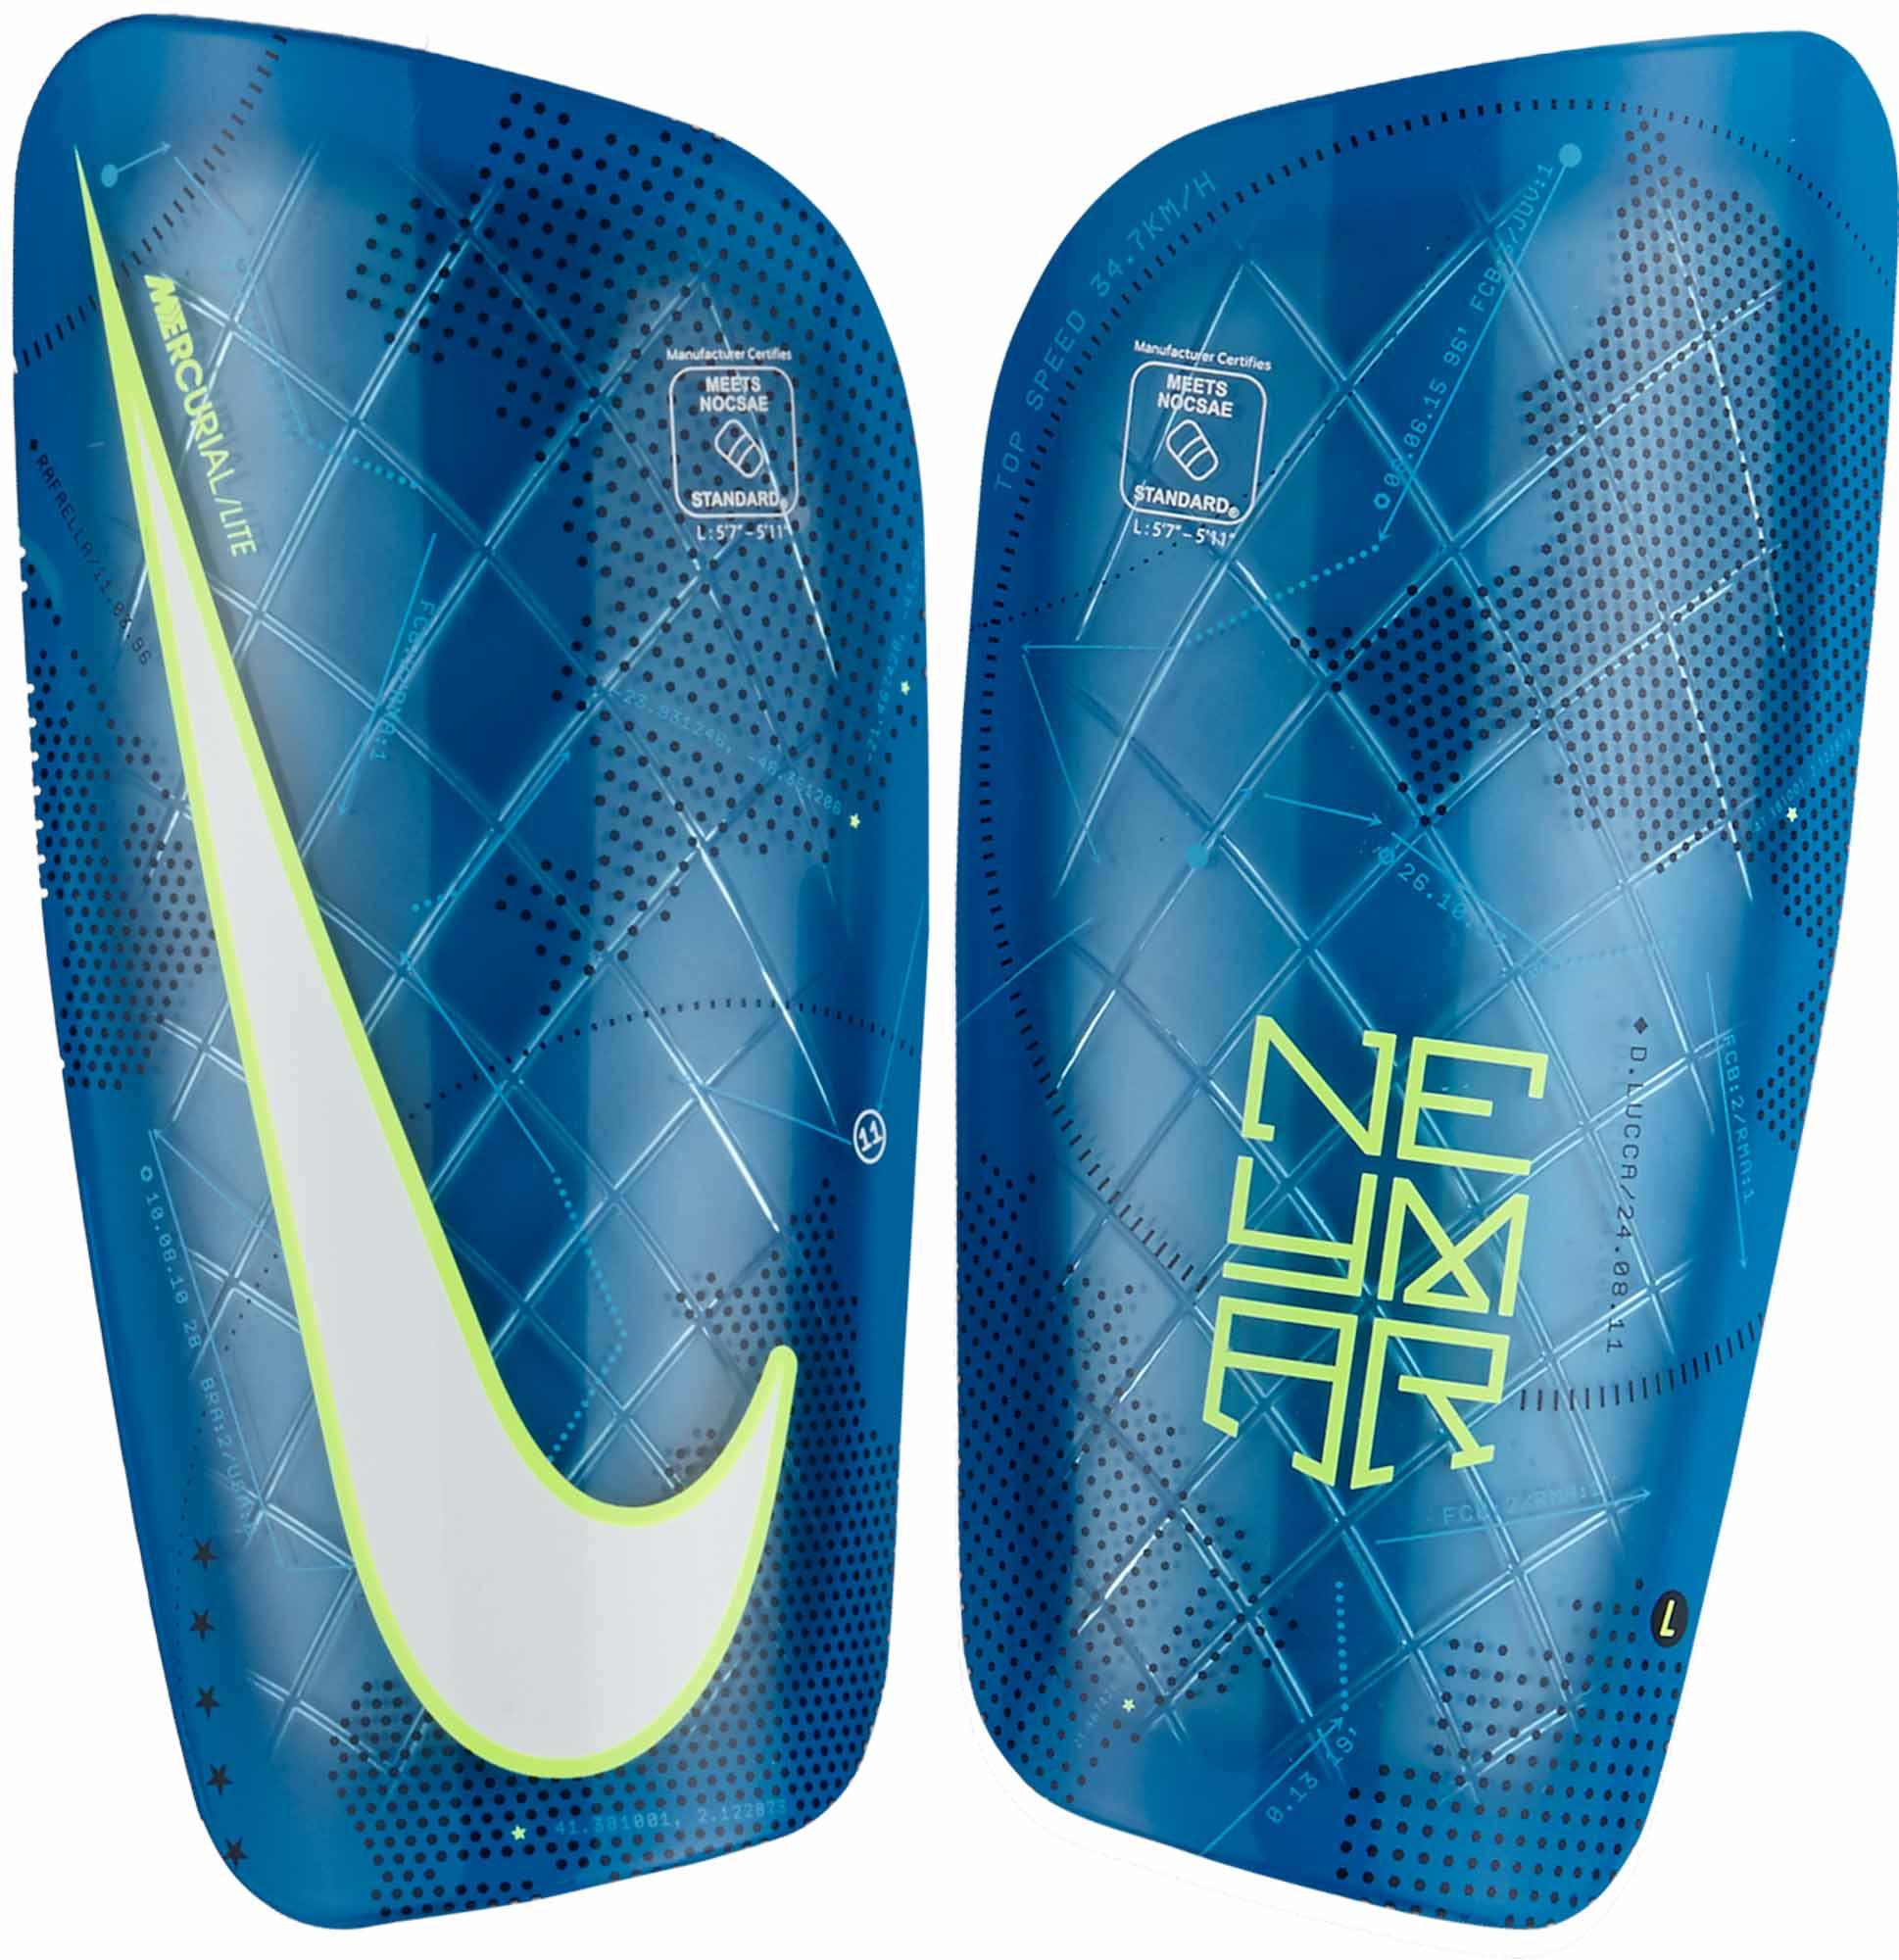 the latest 8aed4 06013 Nike Mercurial Lite Shin Guards - Neymar - Blue Orbit & Volt - Soccer ...